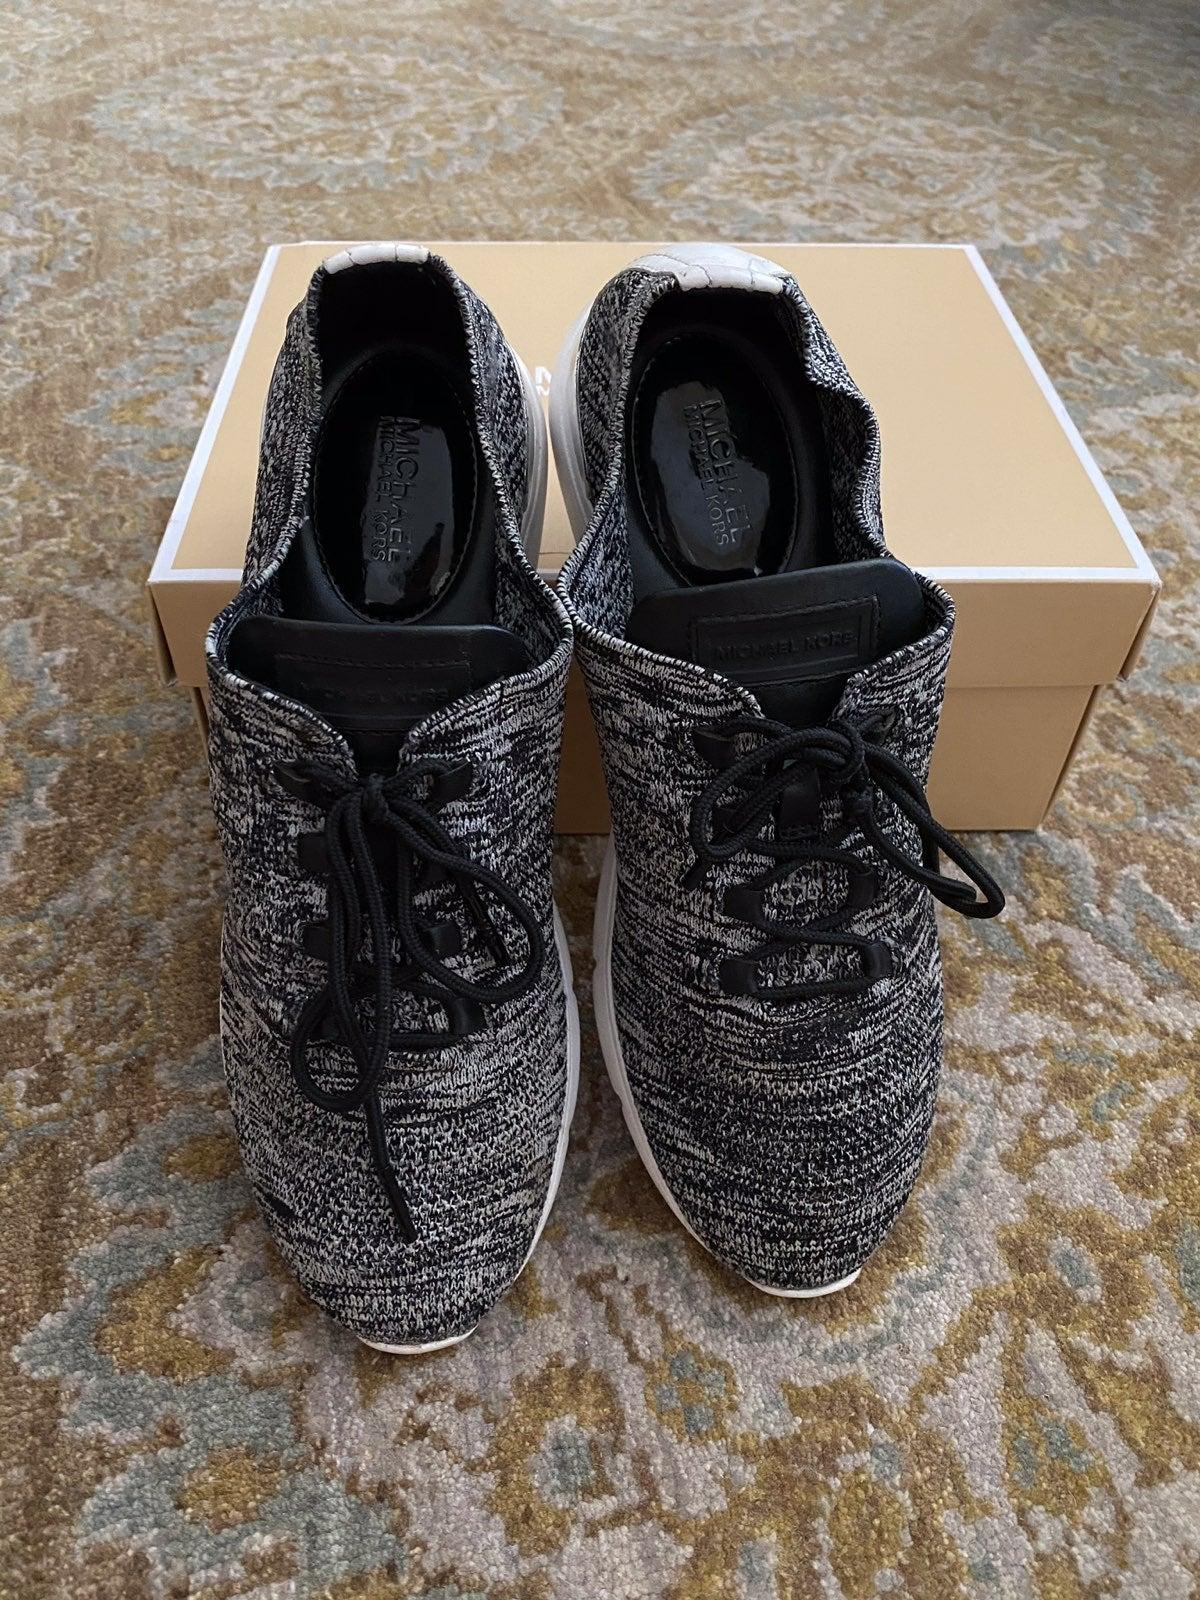 Michael Kors women casual shoes 7.5